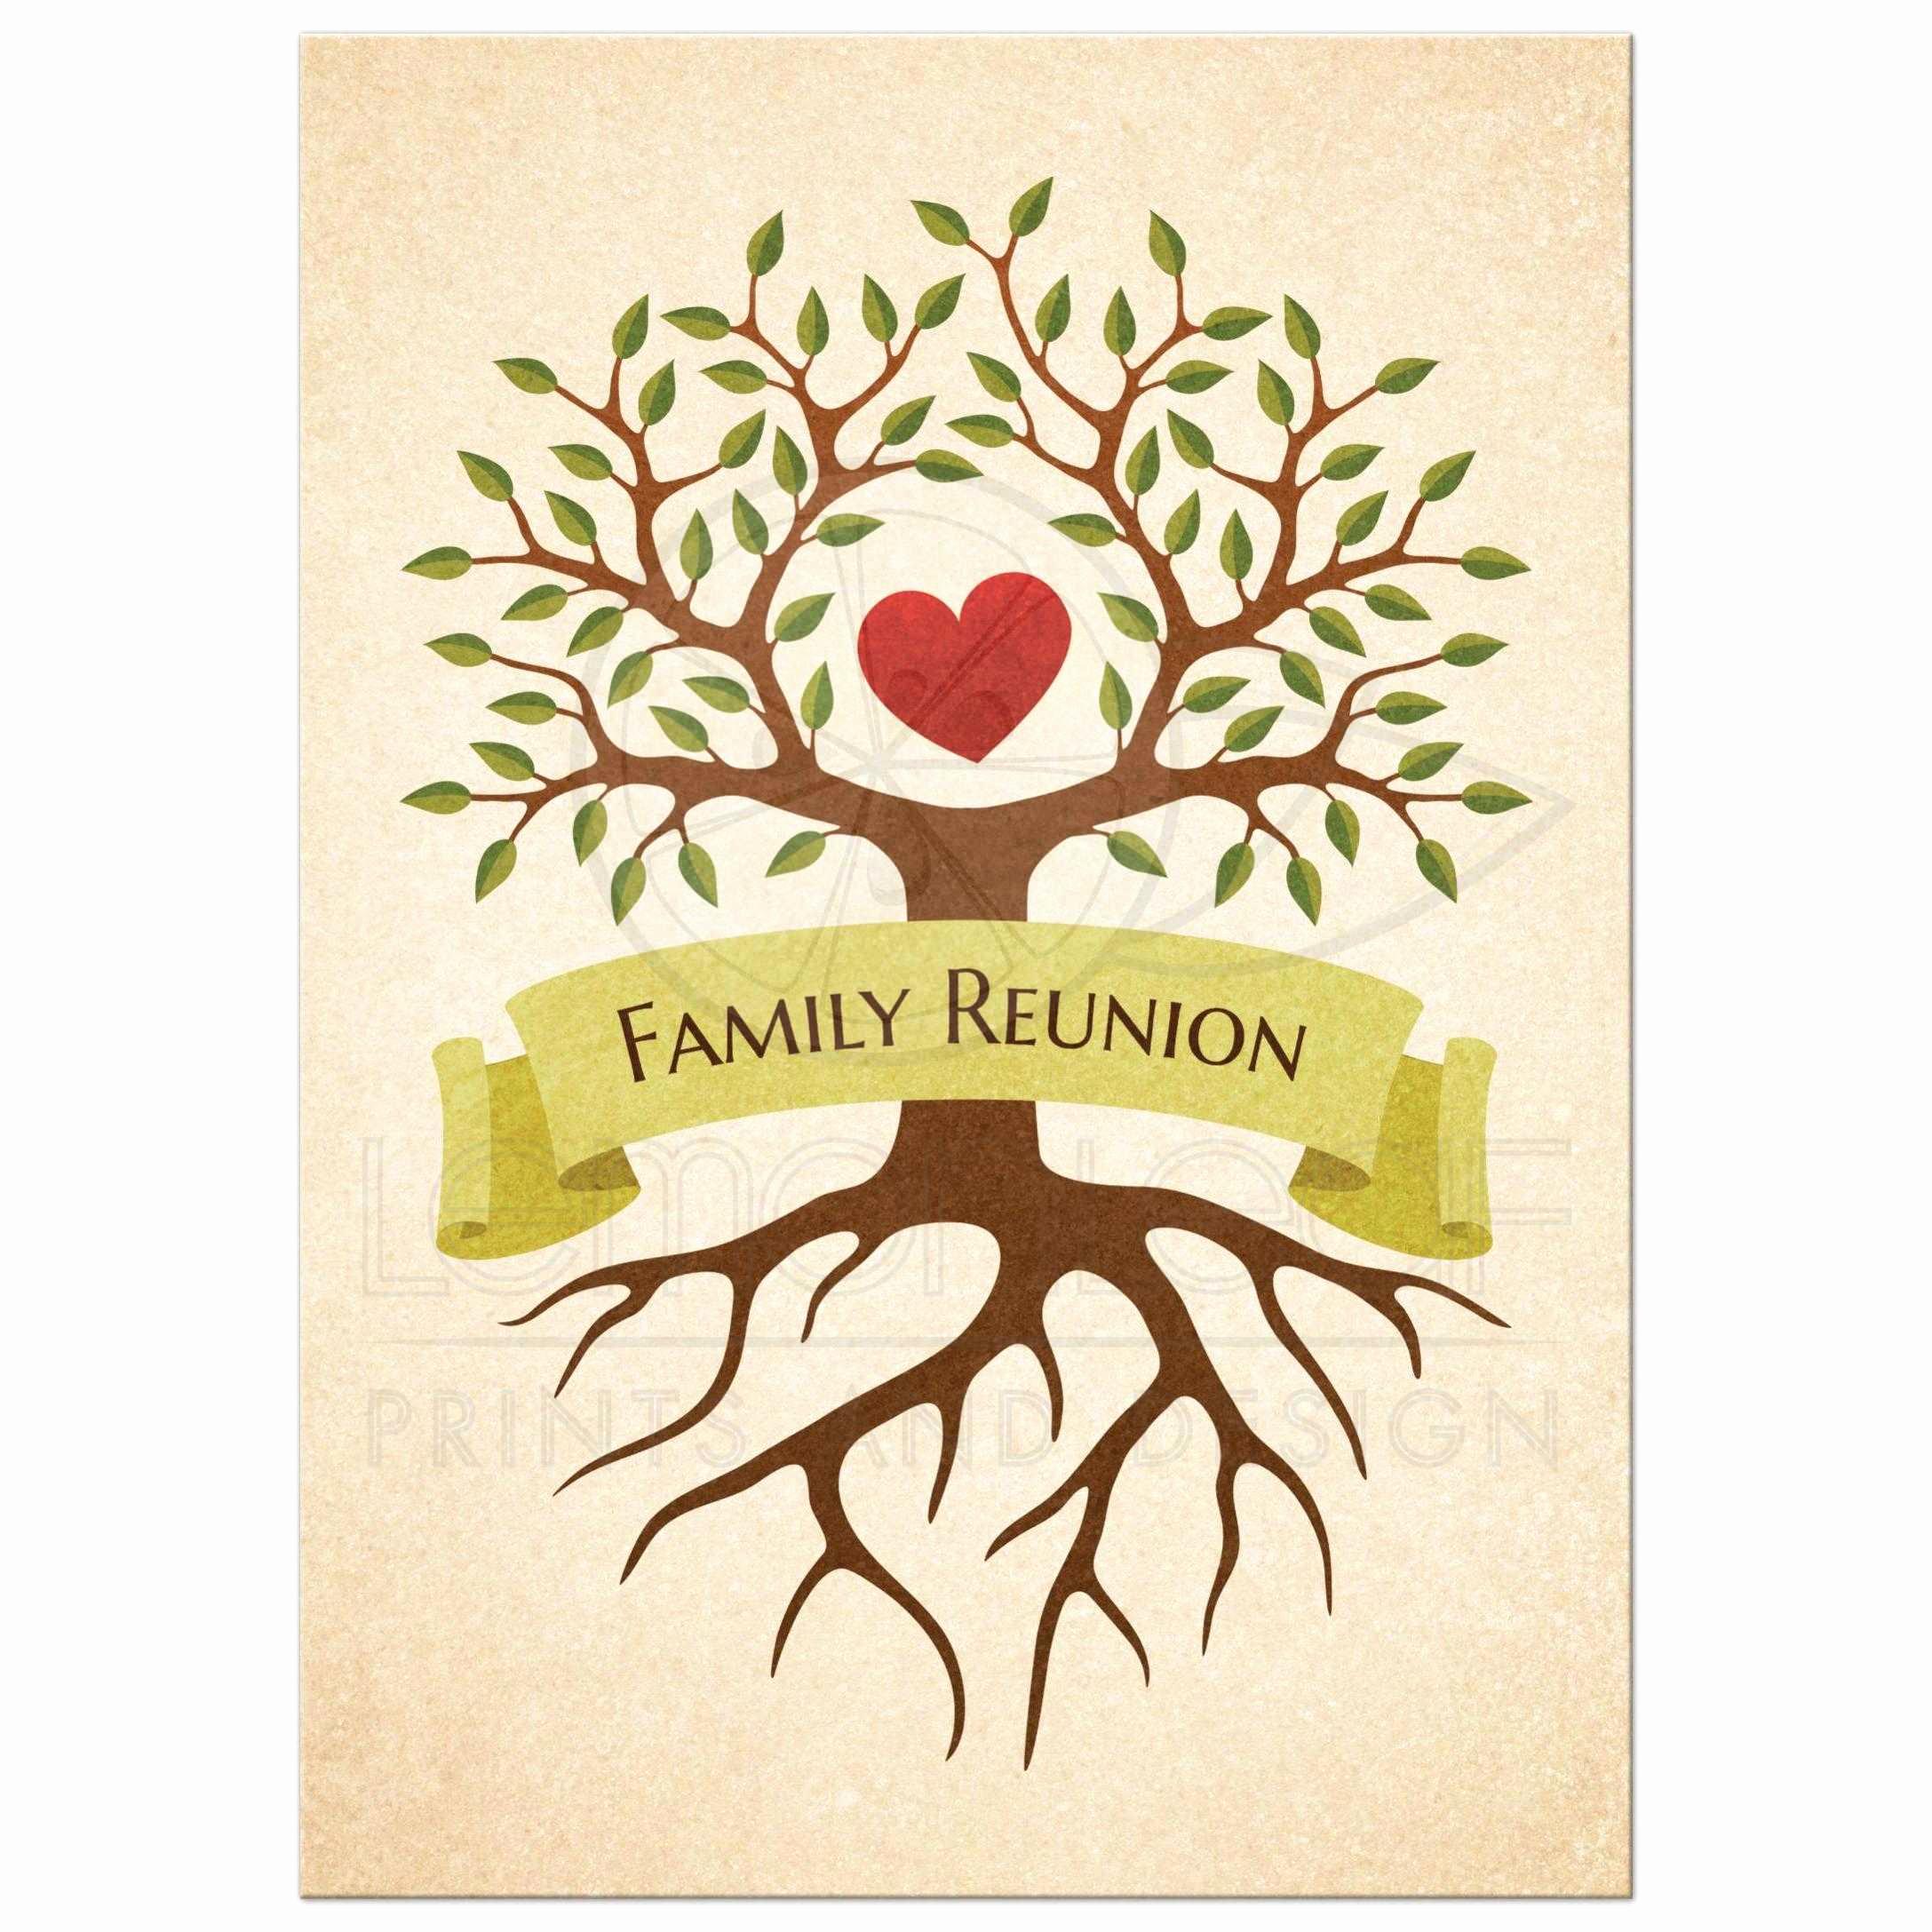 Family Reunion Invitation Wording Lovely Family Reunion Invitations with Beautiful Heart Tree